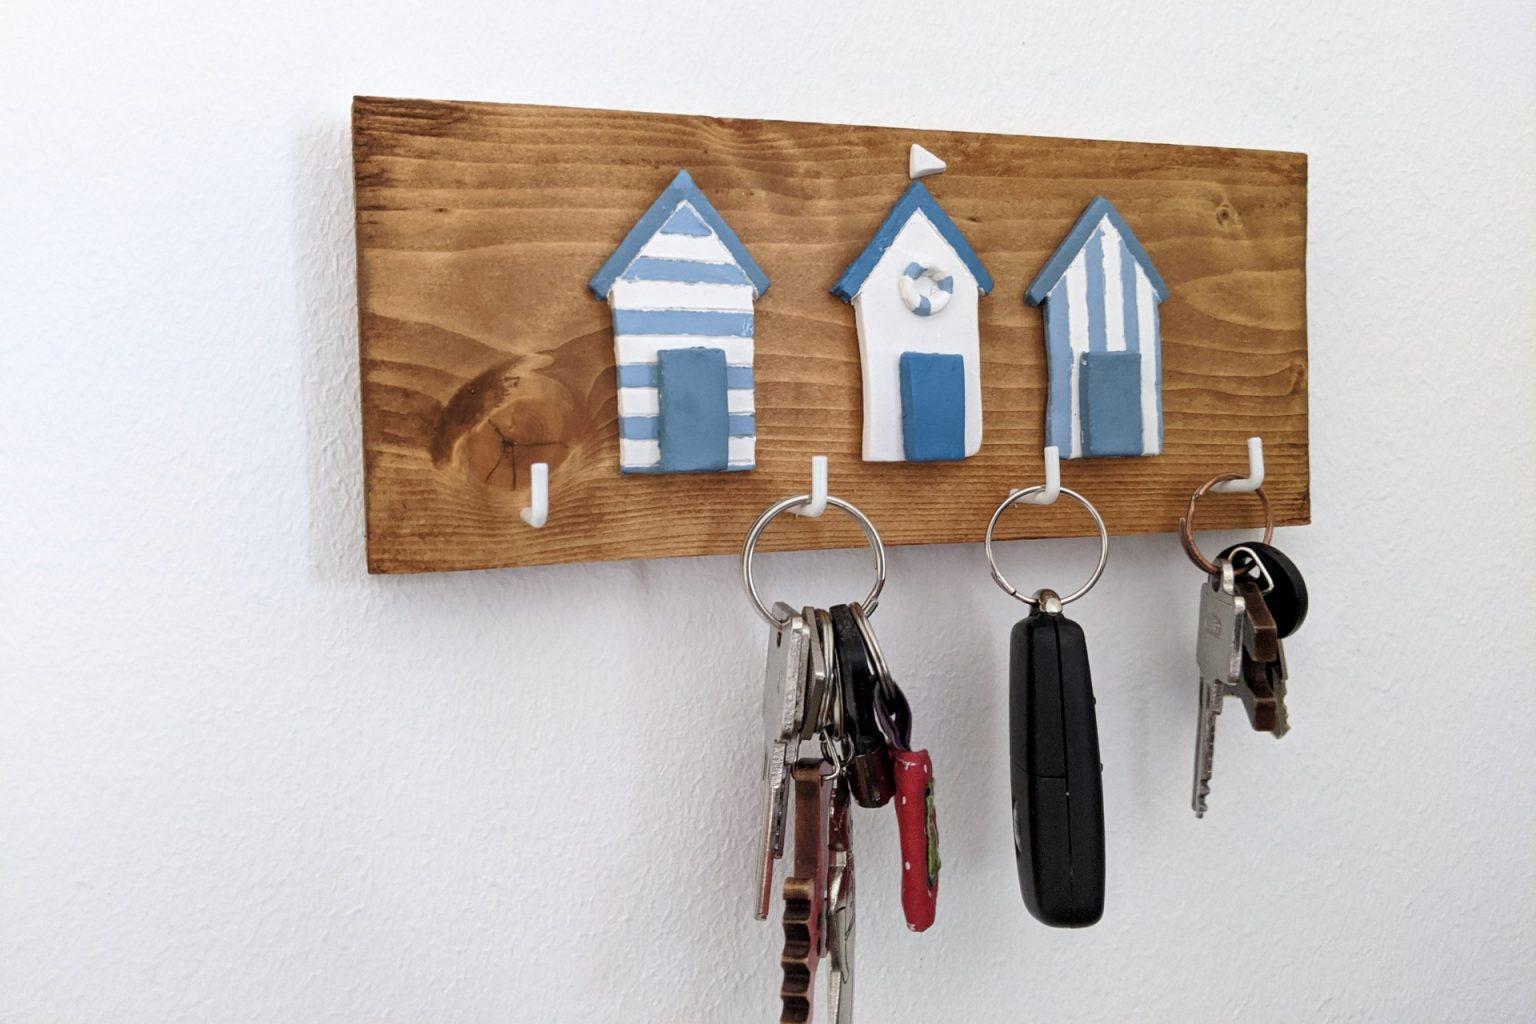 DIY Schlüsselbrett selber bauen Idee